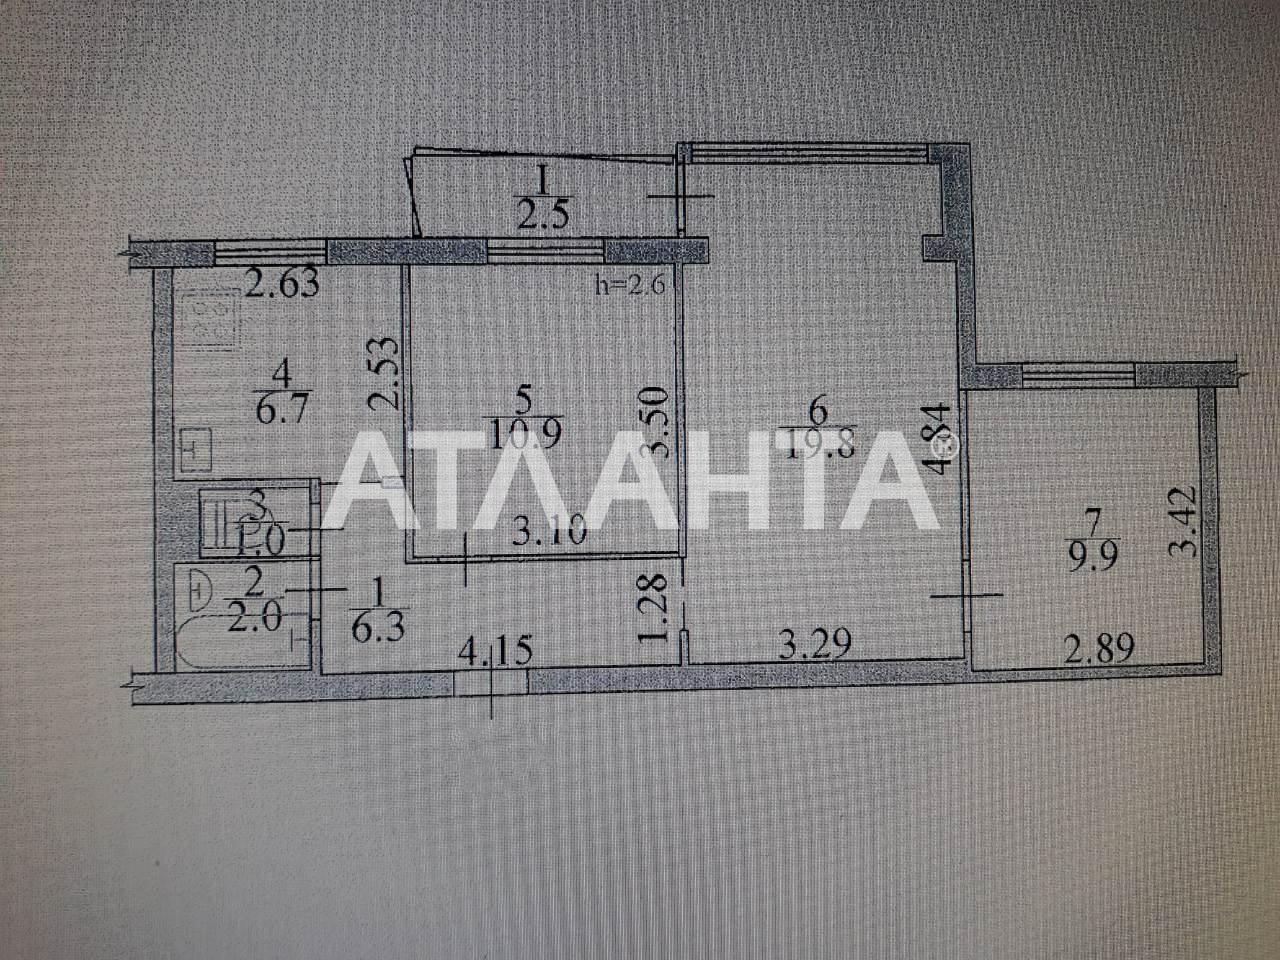 Продается 3-комнатная Квартира на ул. Митрополита В.липковского (Урицкого) — 45 000 у.е. (фото №12)